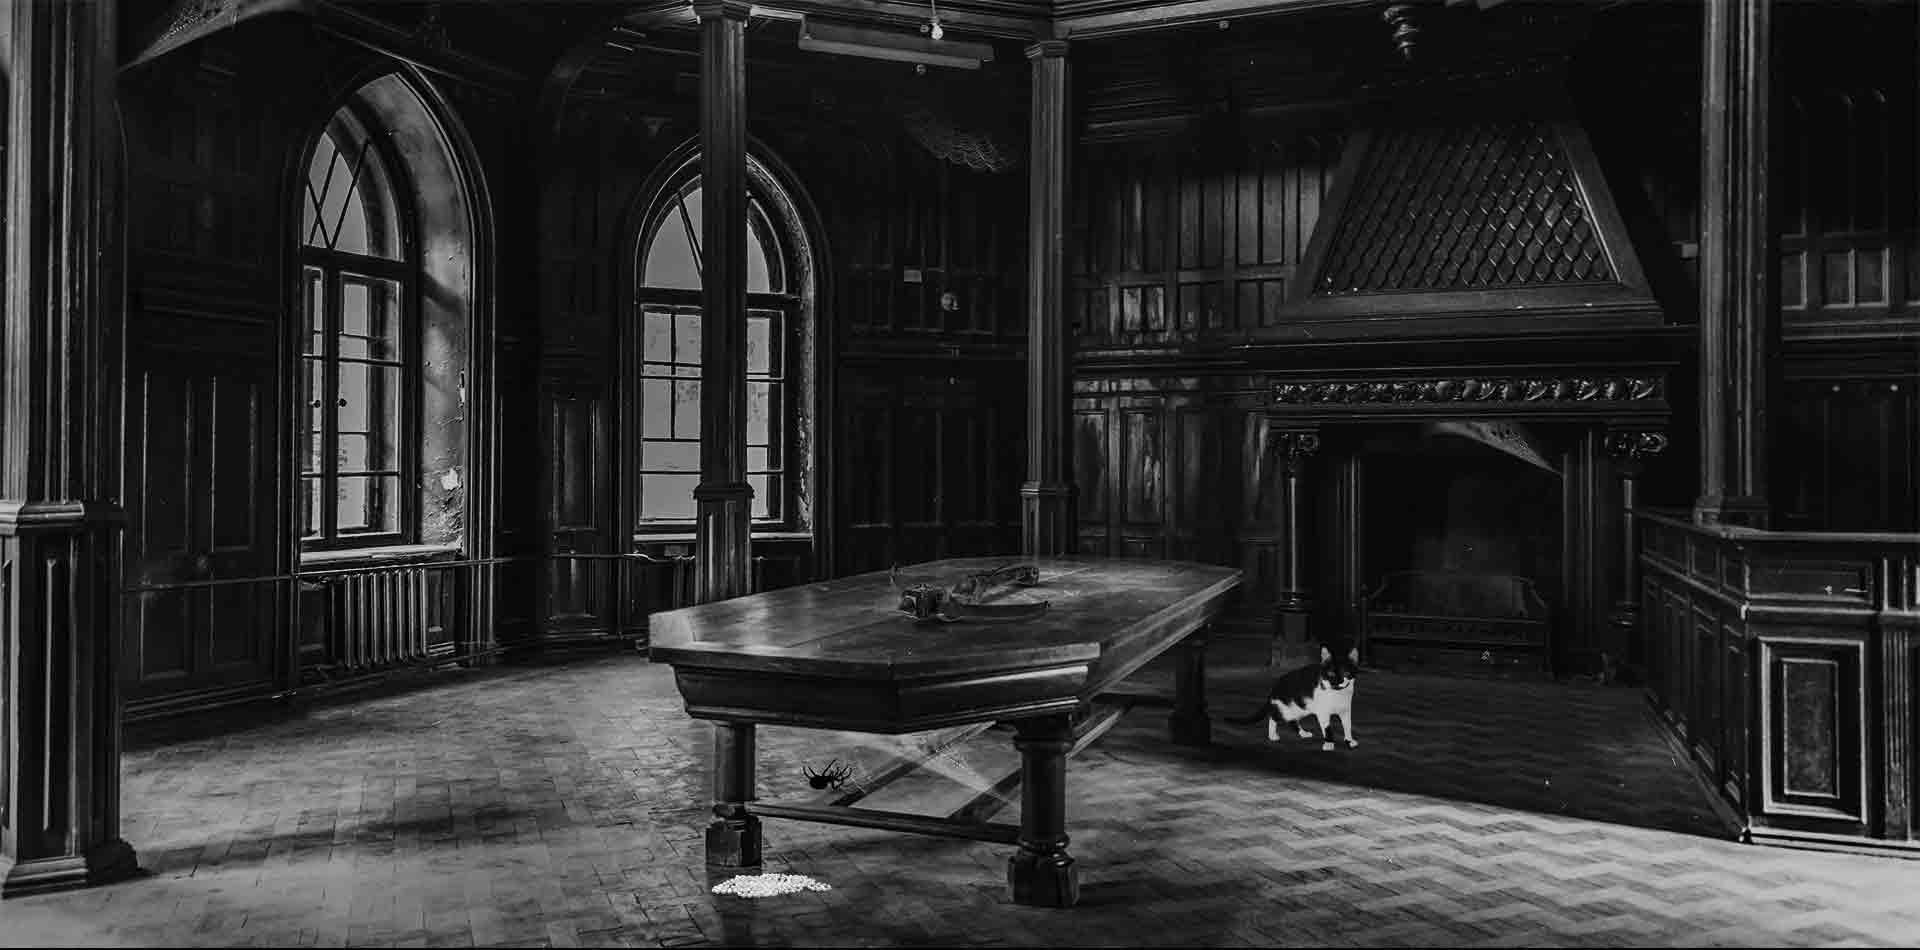 Krimidinner Iv Teil Spuk Von Darkwood Castle